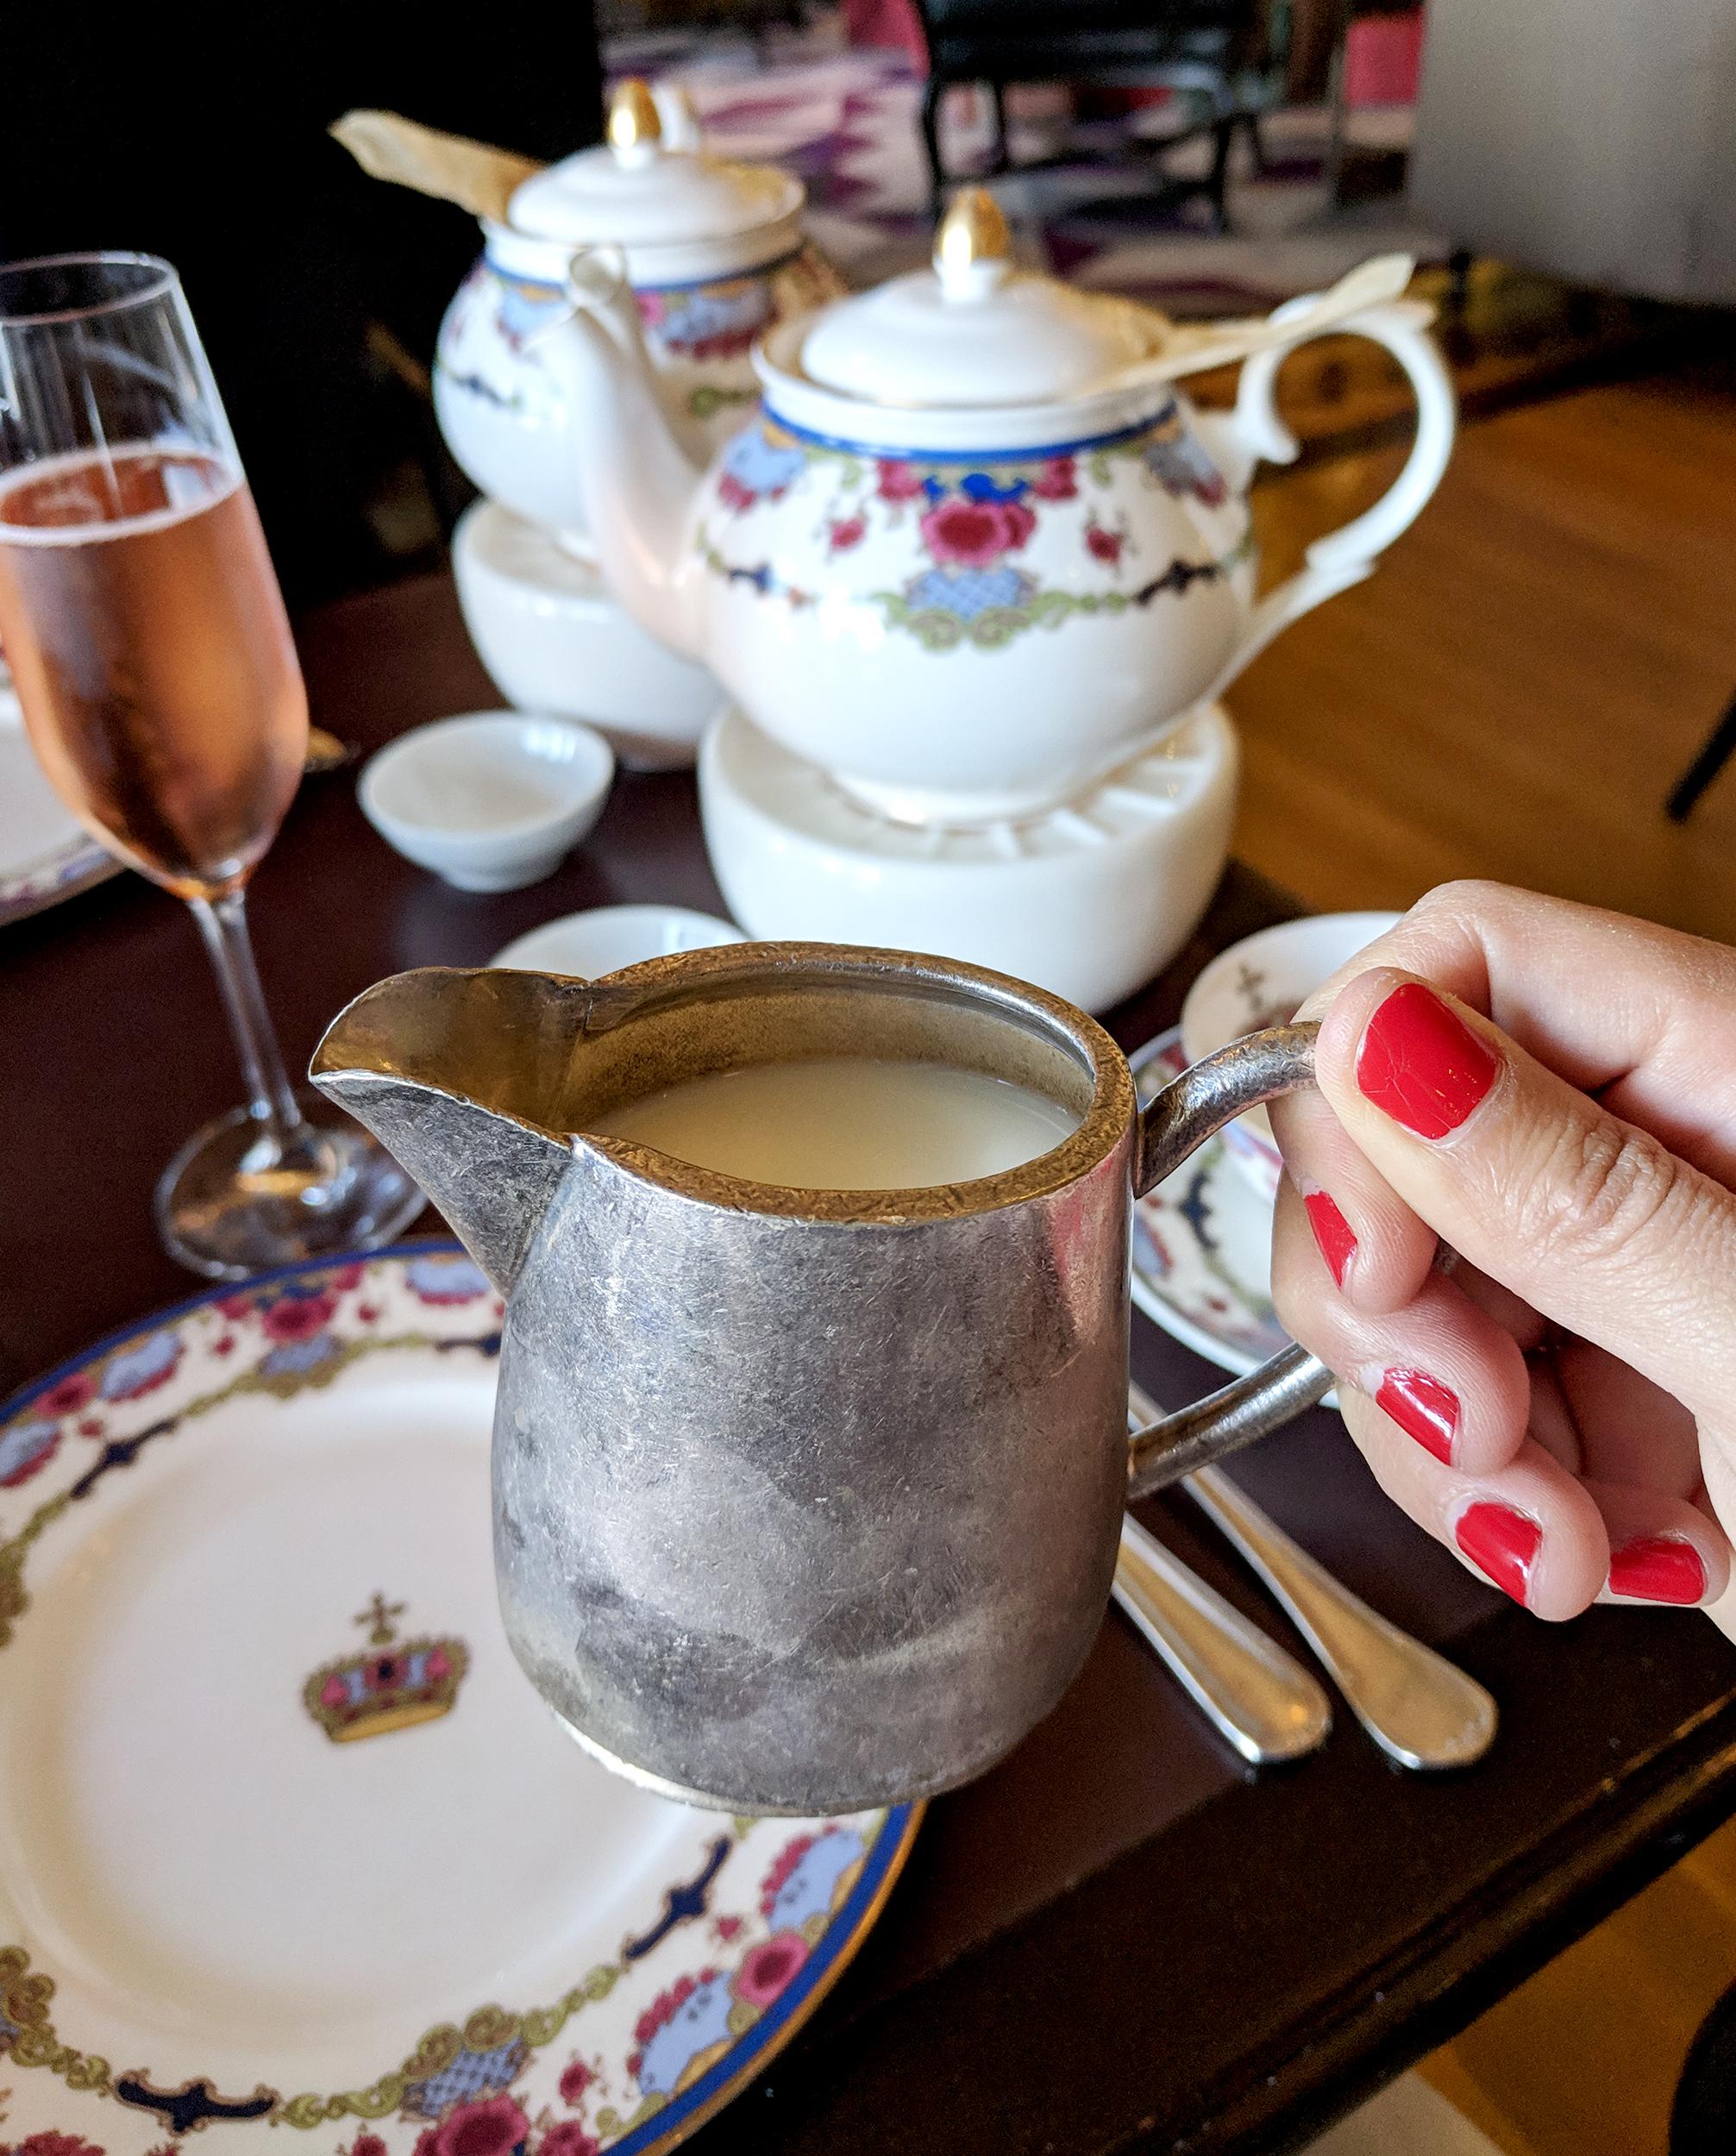 Tea at the Empress milk pitcher